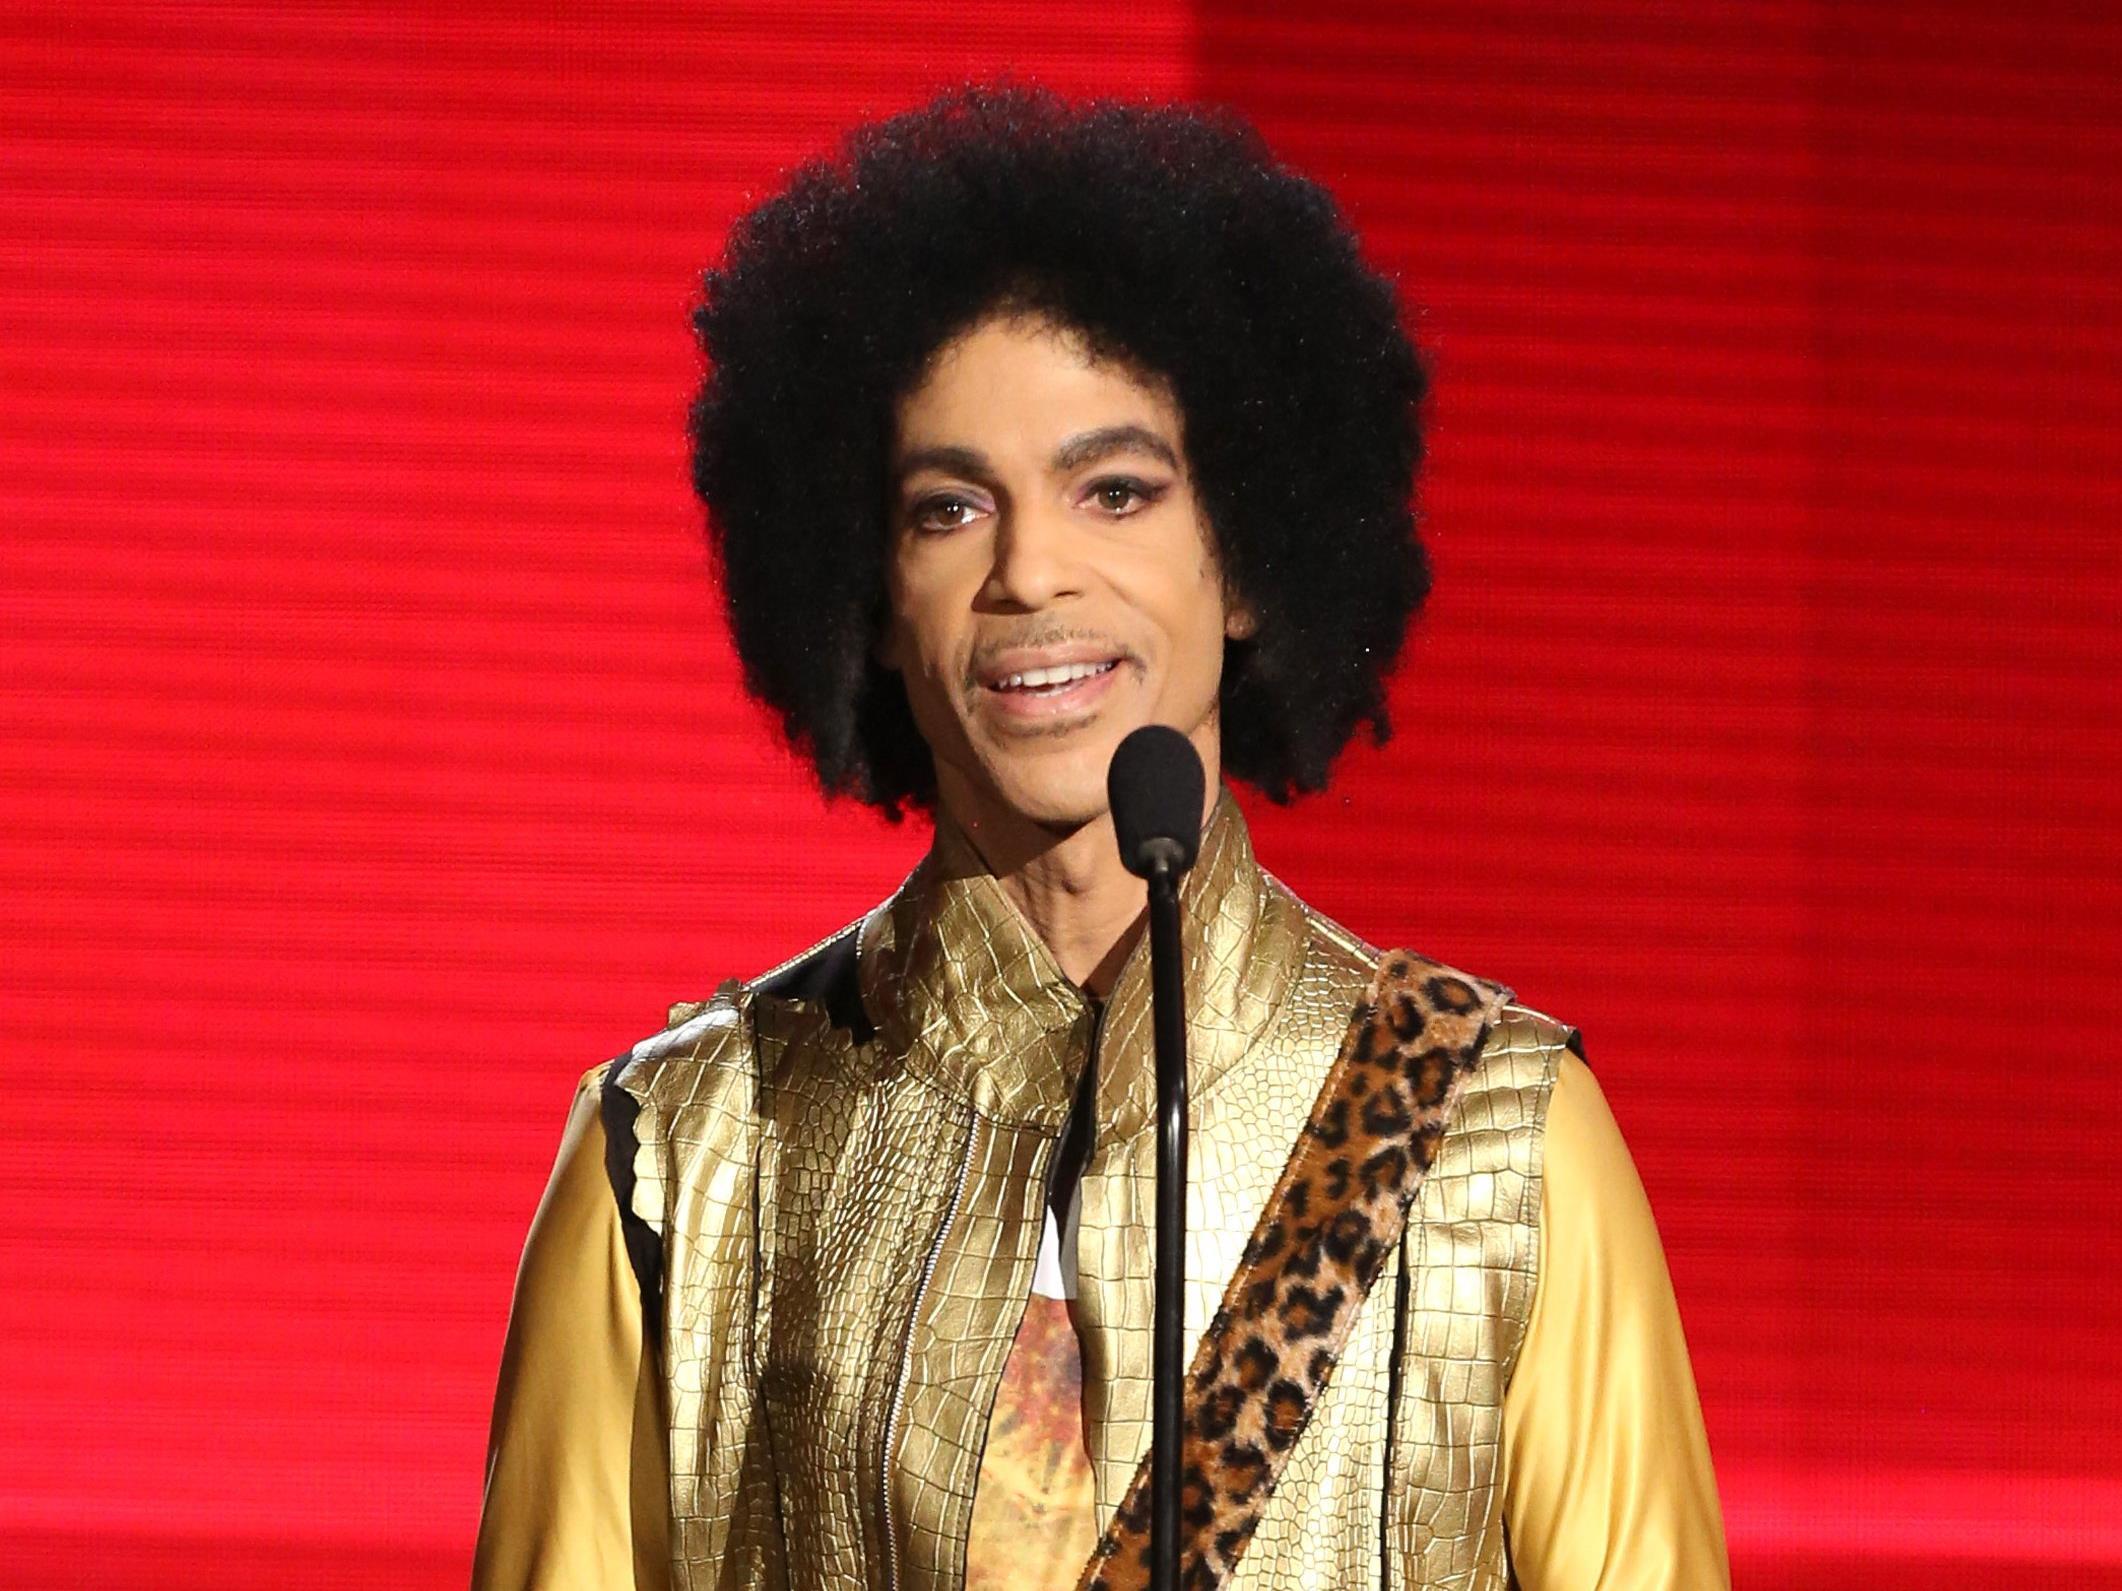 Musik-Superstar Prince ist tot.